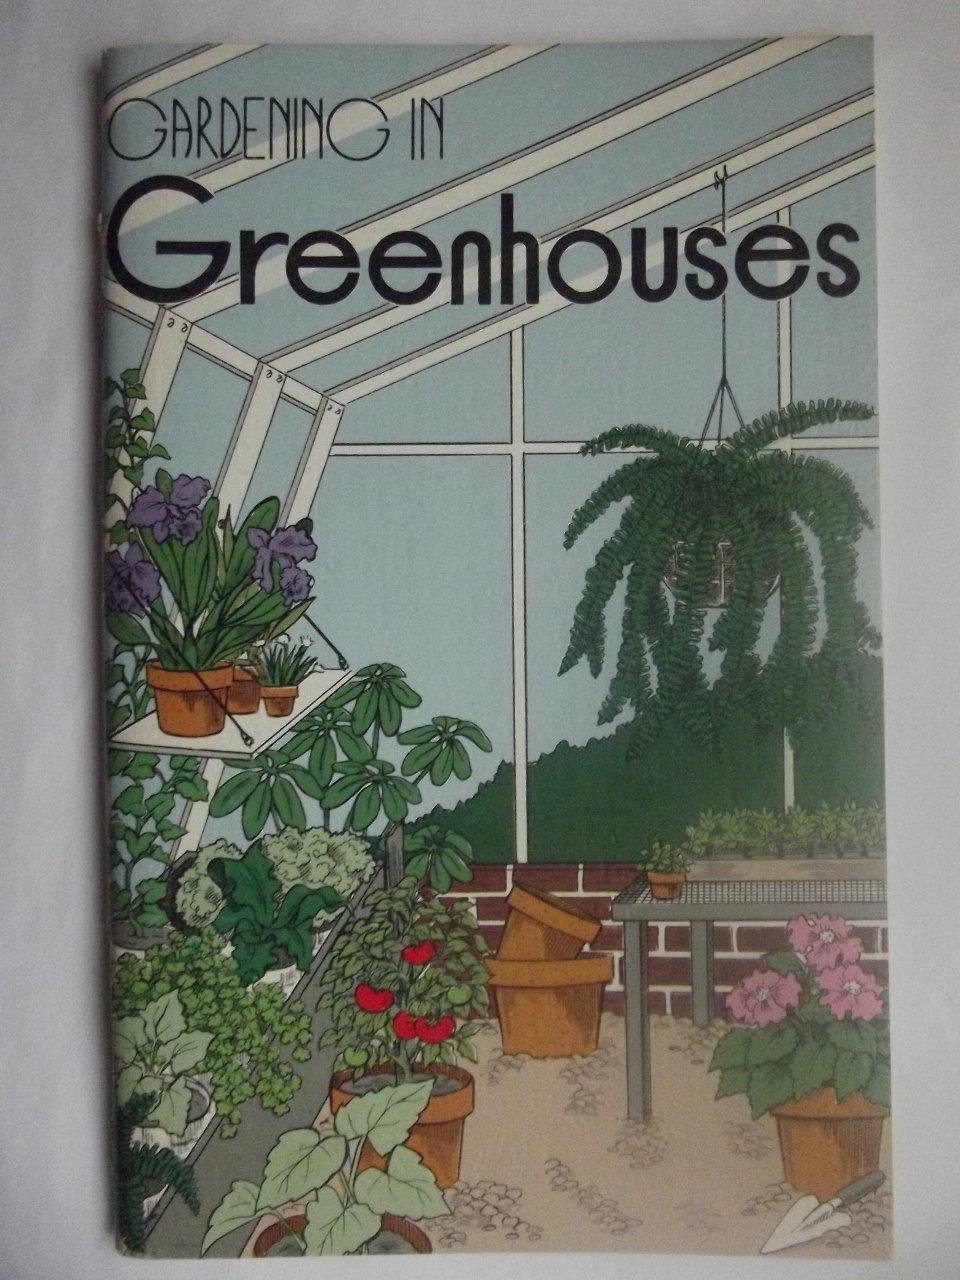 Gardening in greenhouses